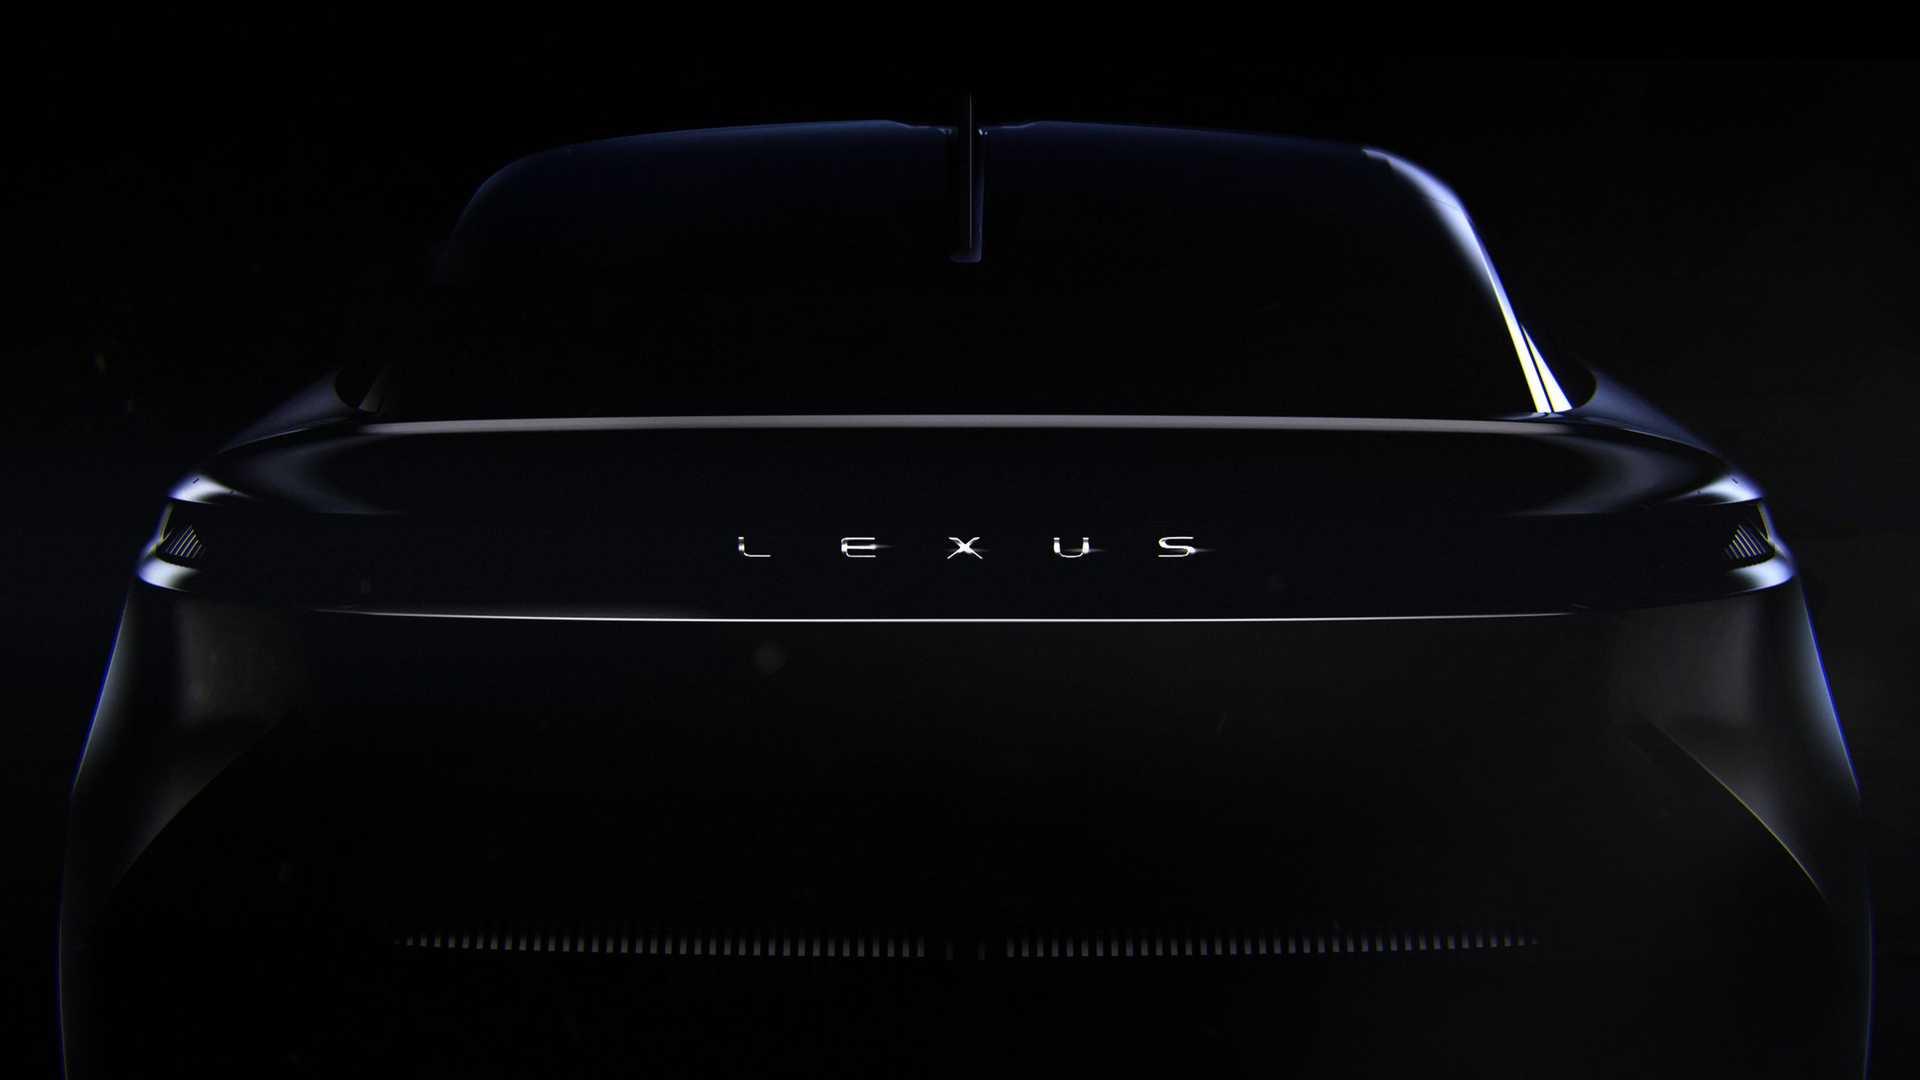 Lexus: Μας δείχνει το μέλλον με ένα ηλεκτρικό SUV